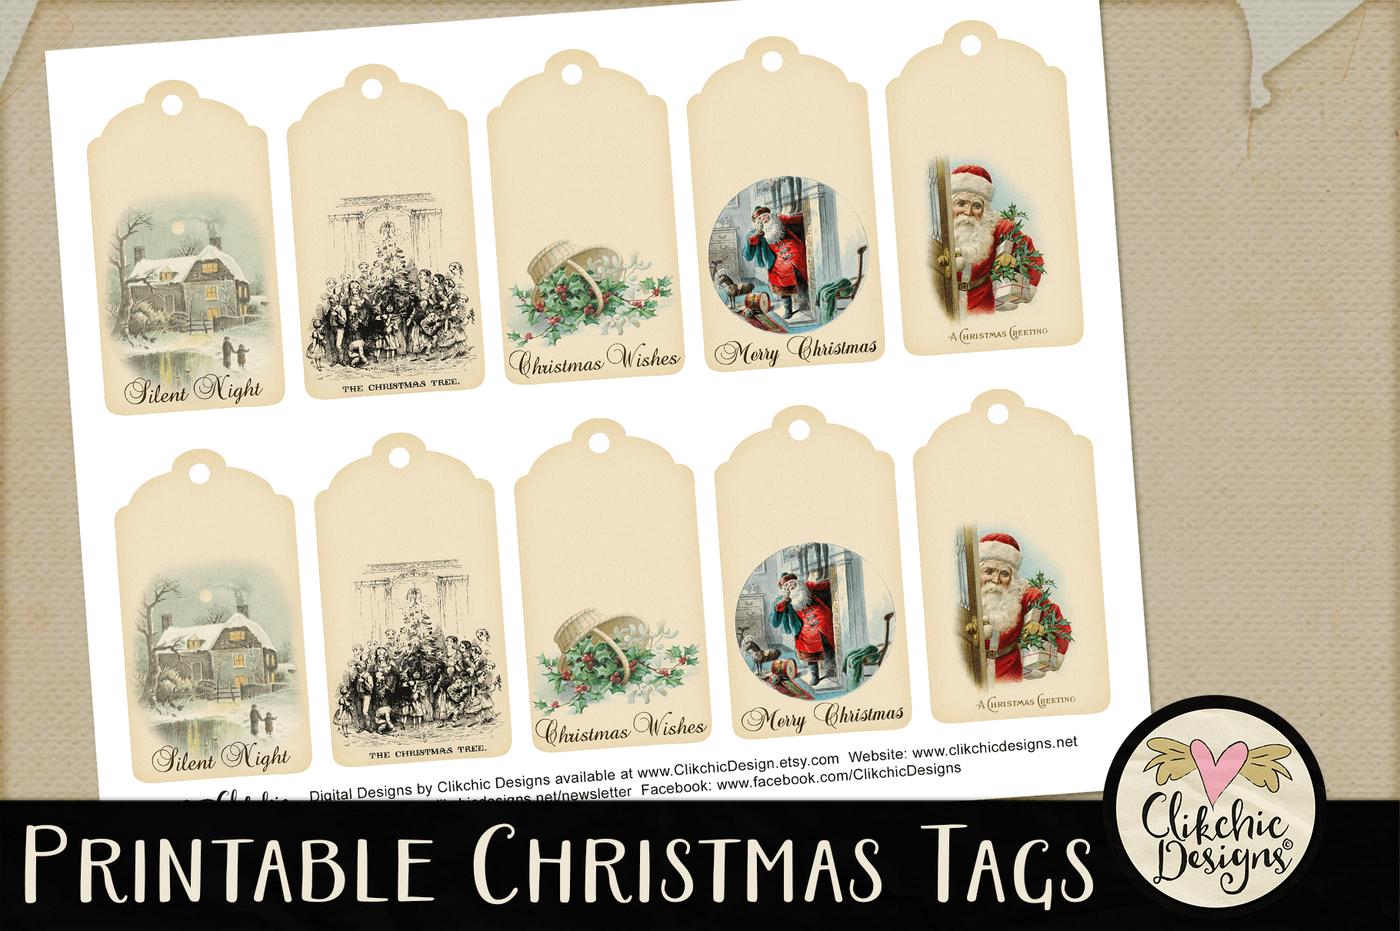 Printable Vintage Christmas Gift Tags By Clikchic Designs Thehungryjpeg Com